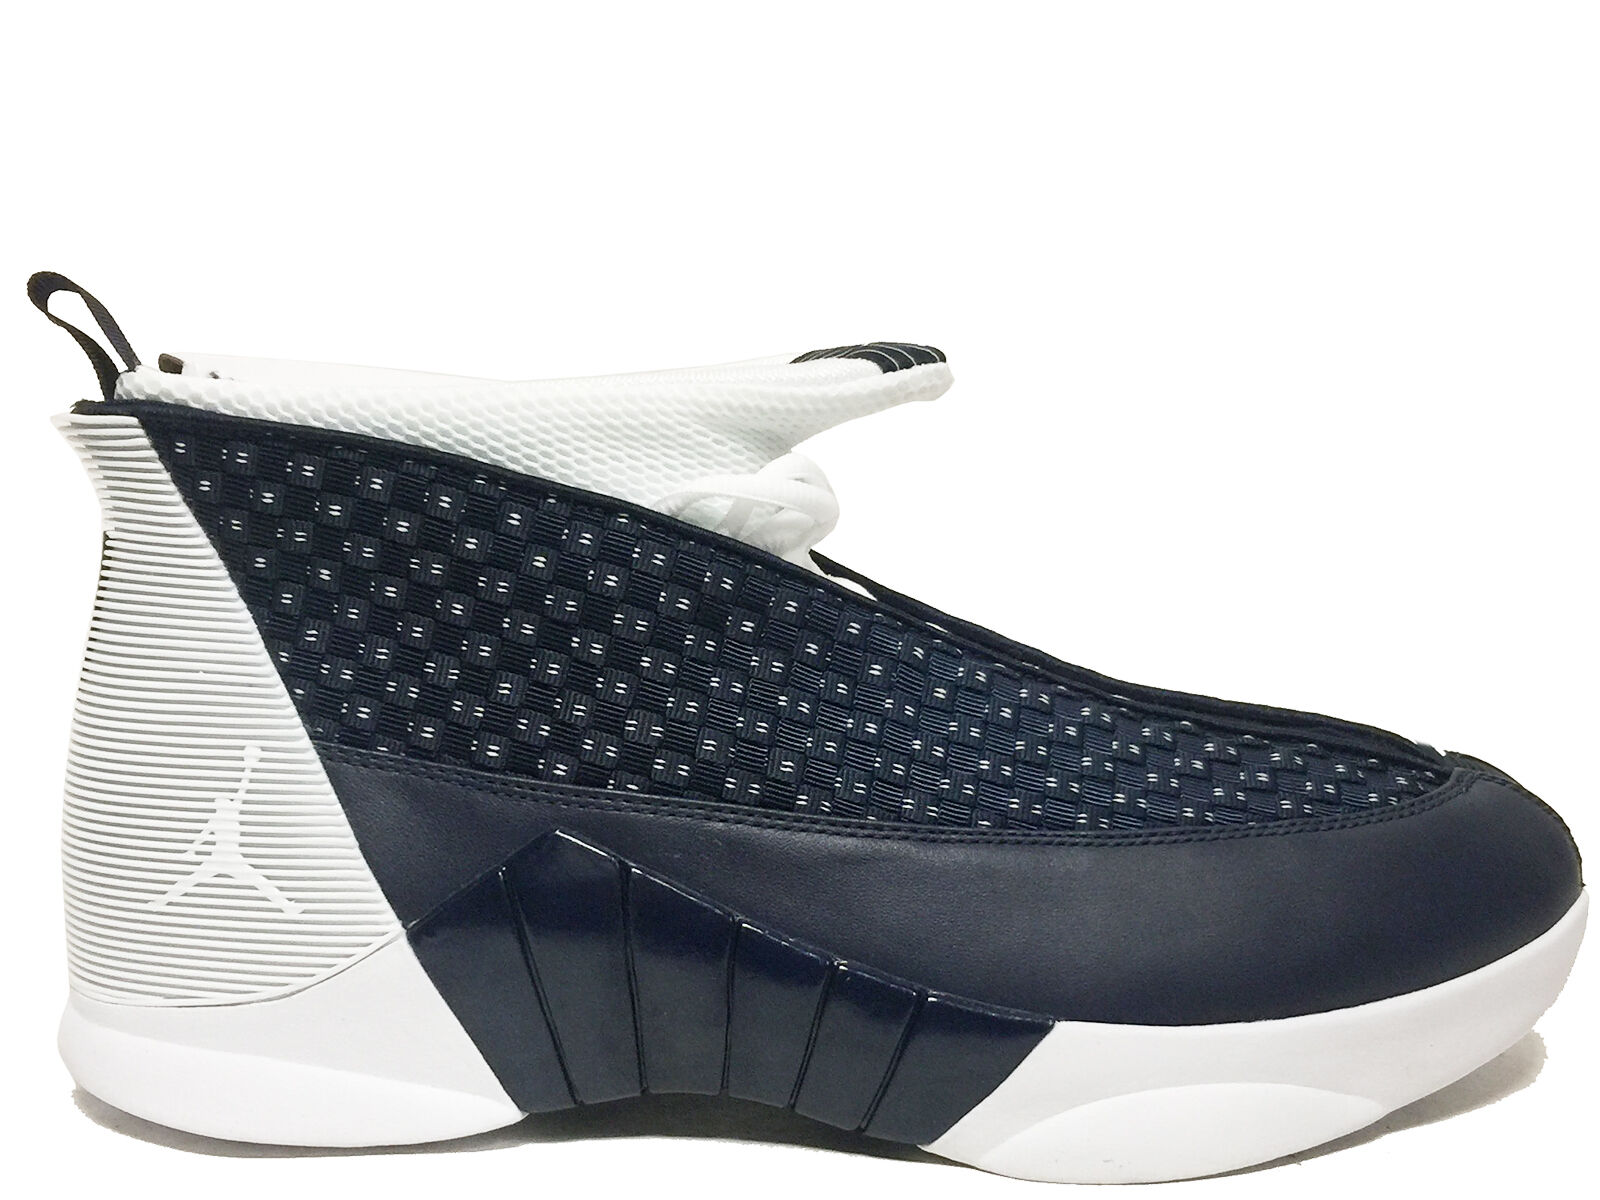 Brand New Air Jordan 15 Retro Men's Athletic Fashion Sneakers [881429 400]